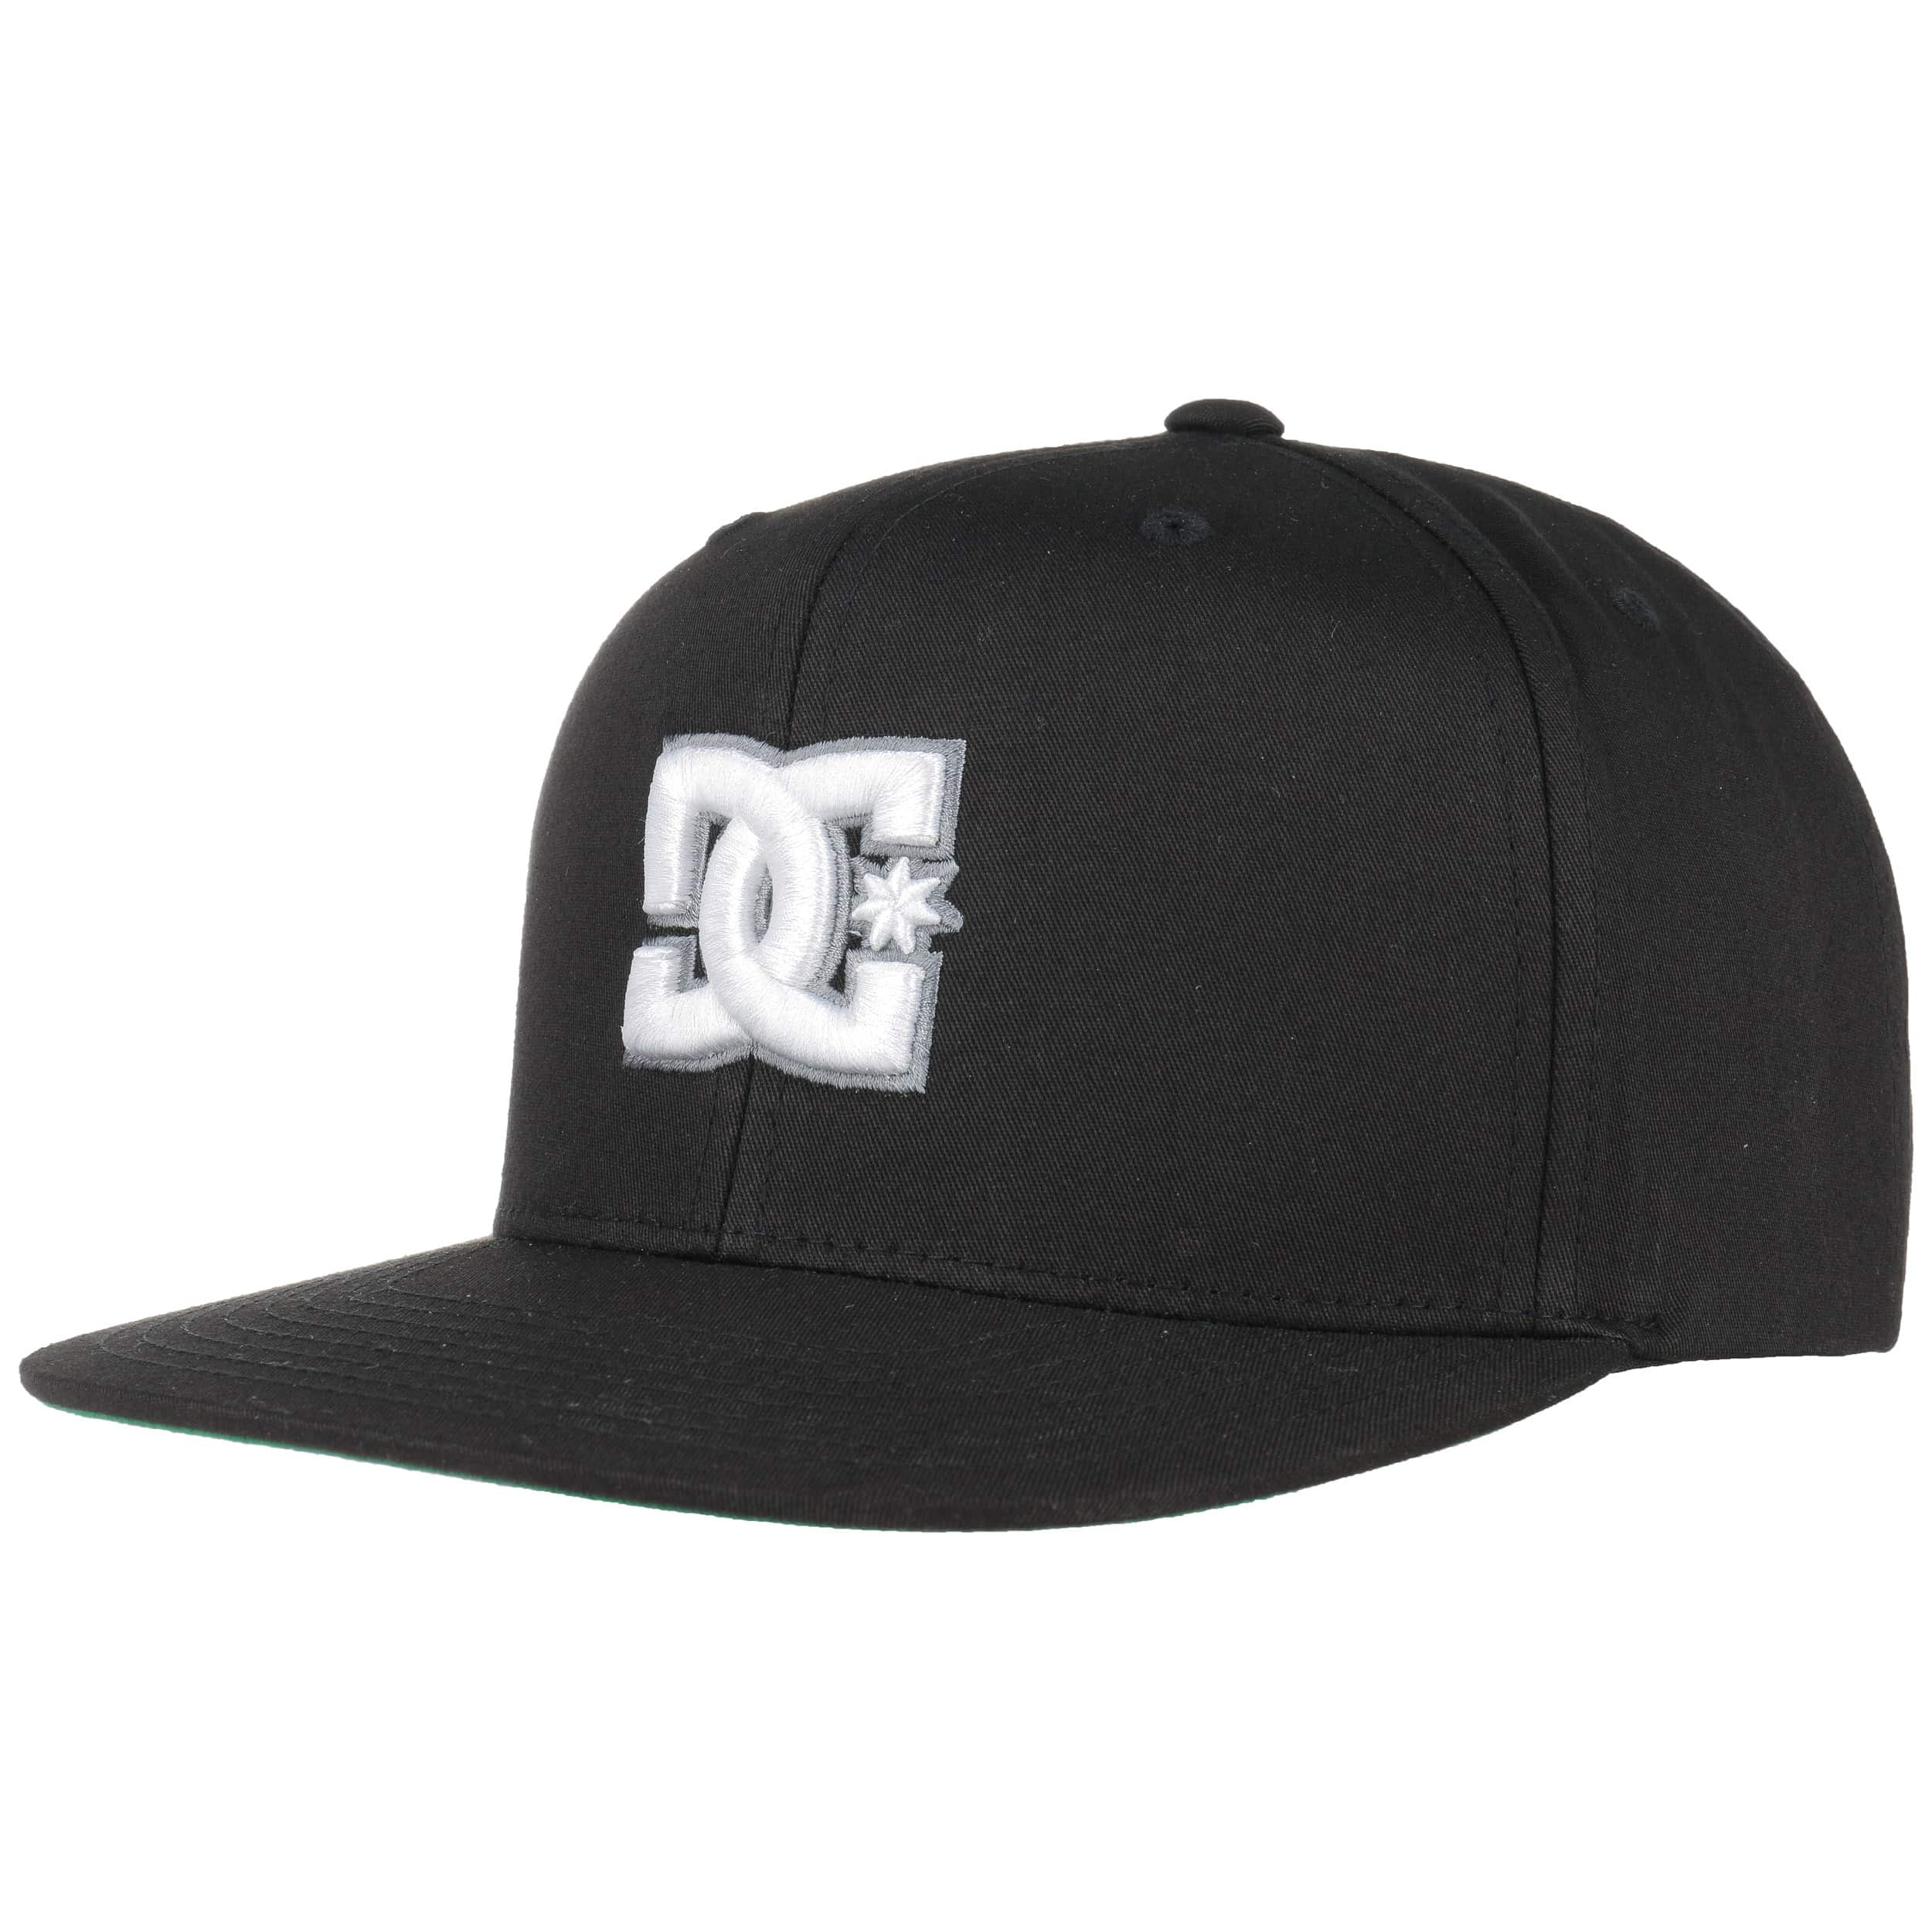 Gorra Snapback Snappy by DC Shoes Co - Gorras - sombreroshop.es cd876256058